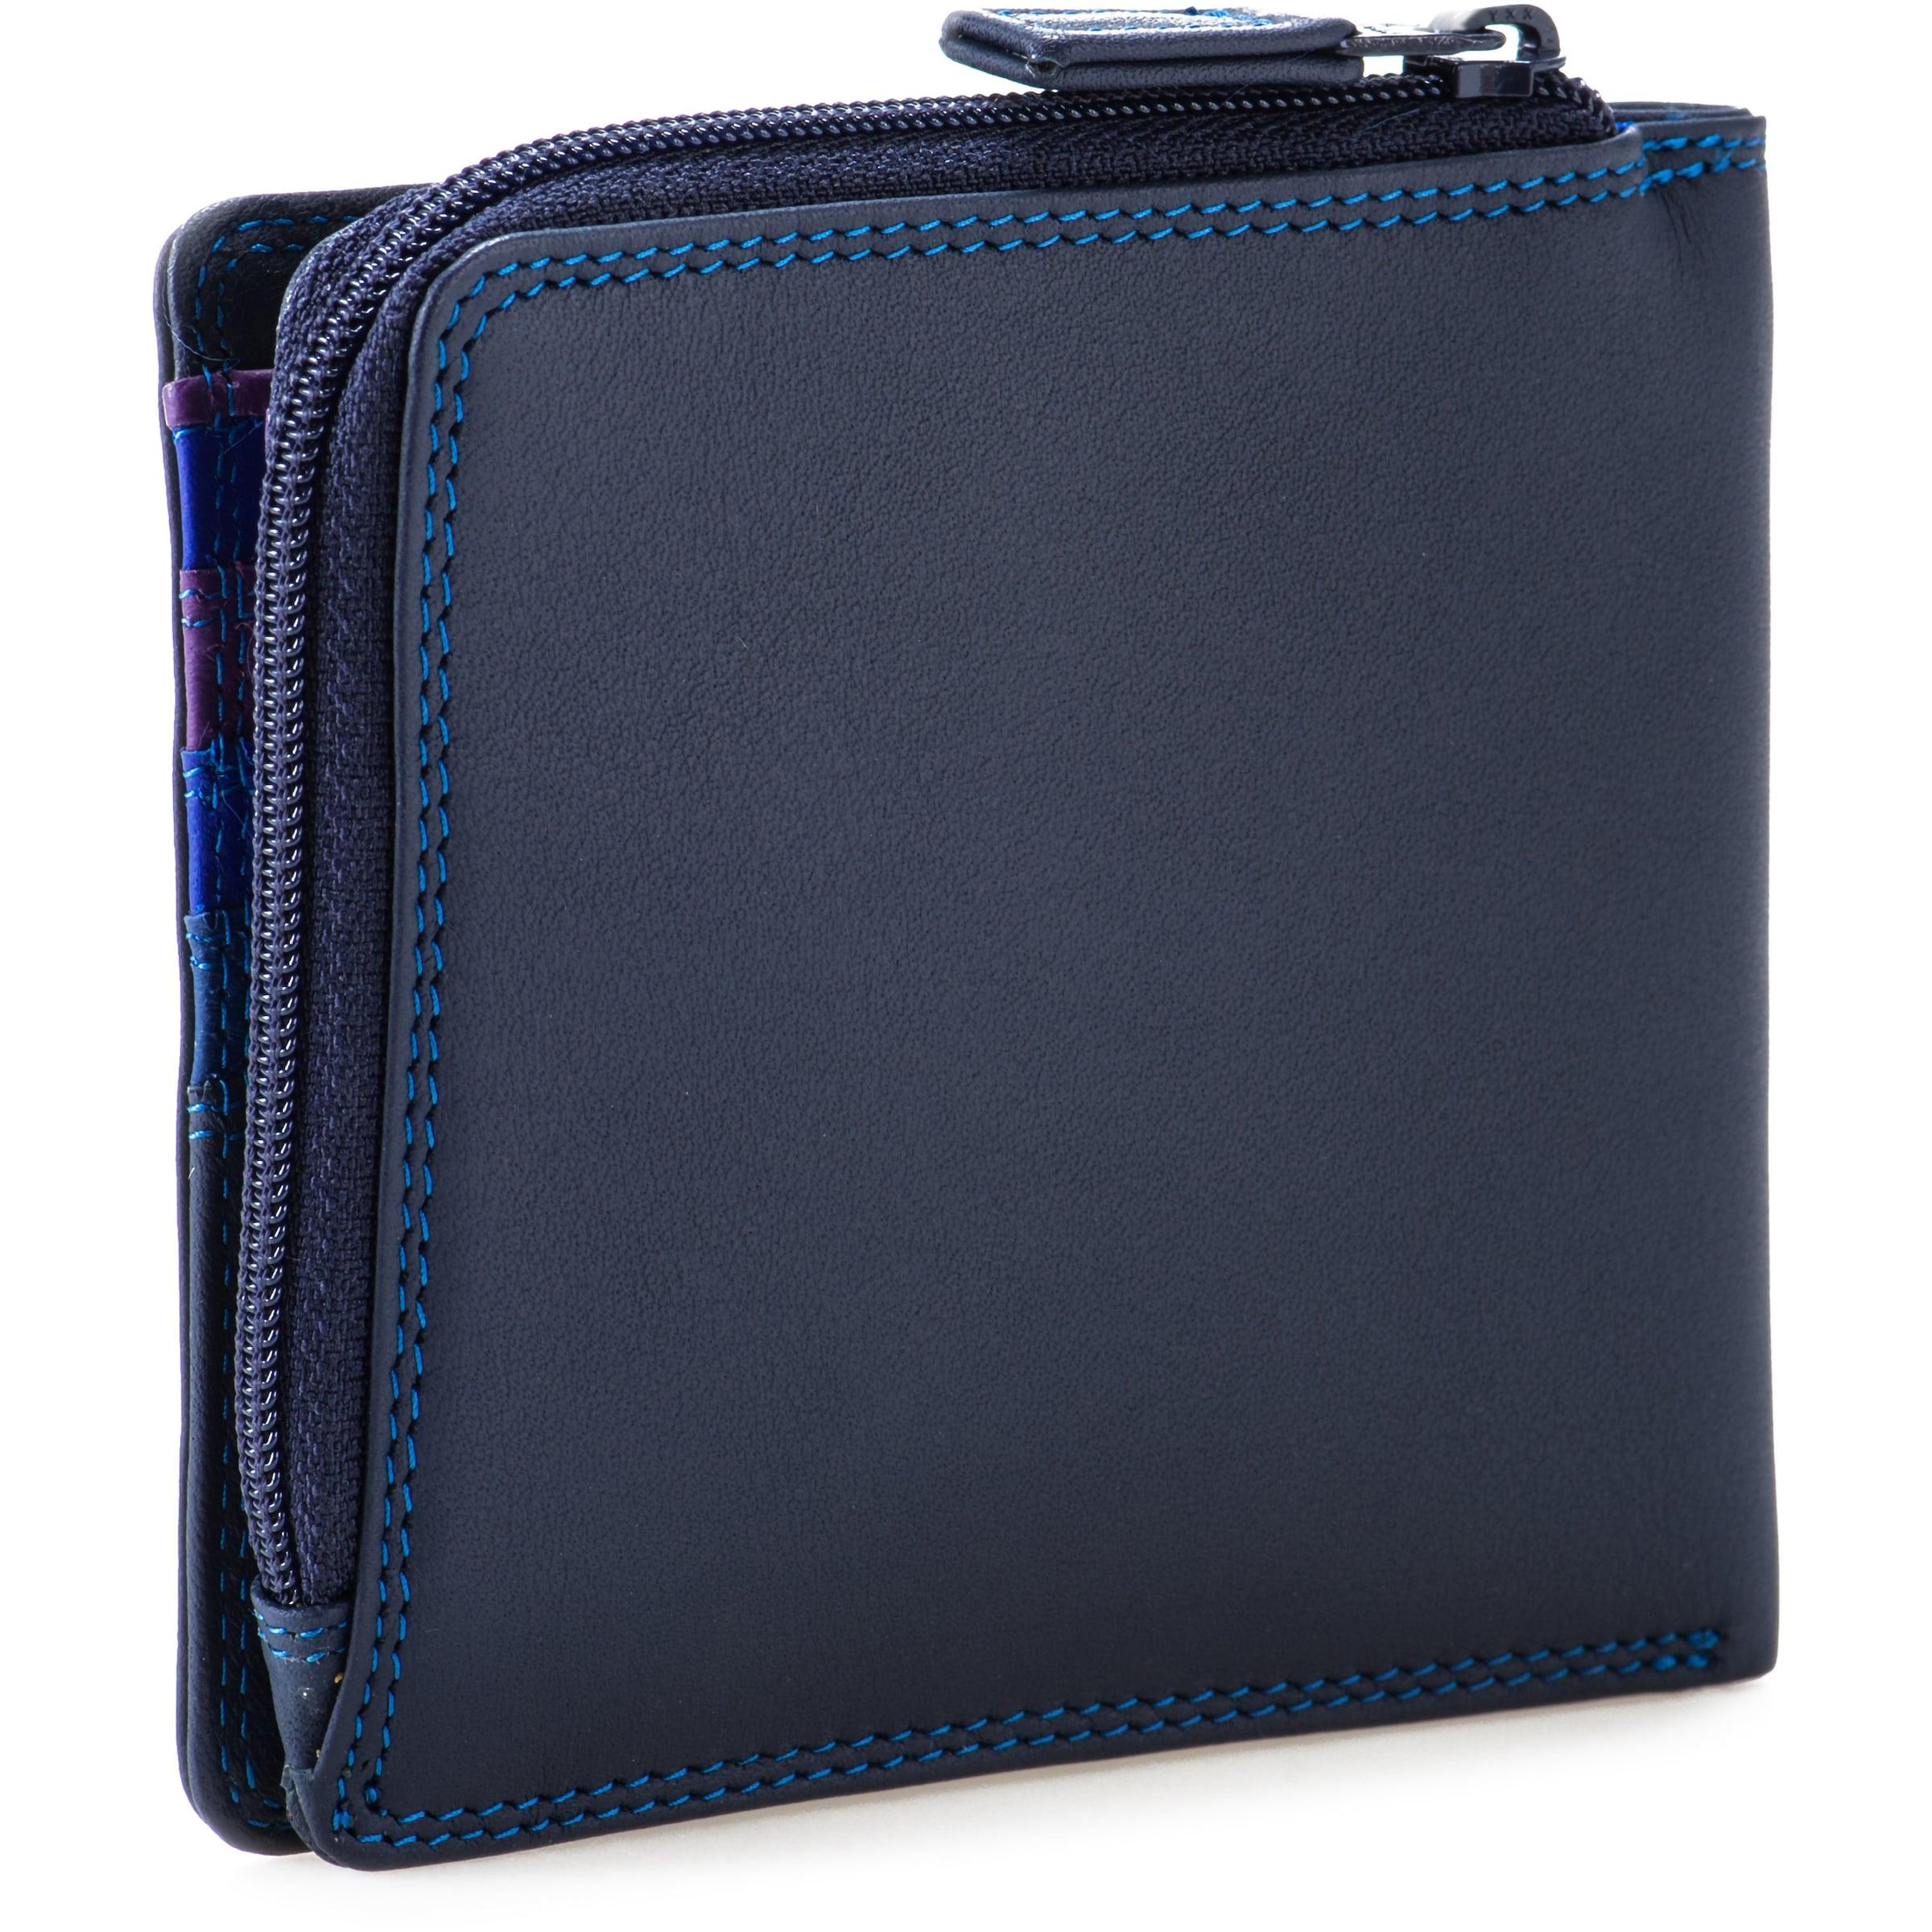 Mywalit In Dunkelblau Geldbörse 'standard Wallet' QBrhdCtxso